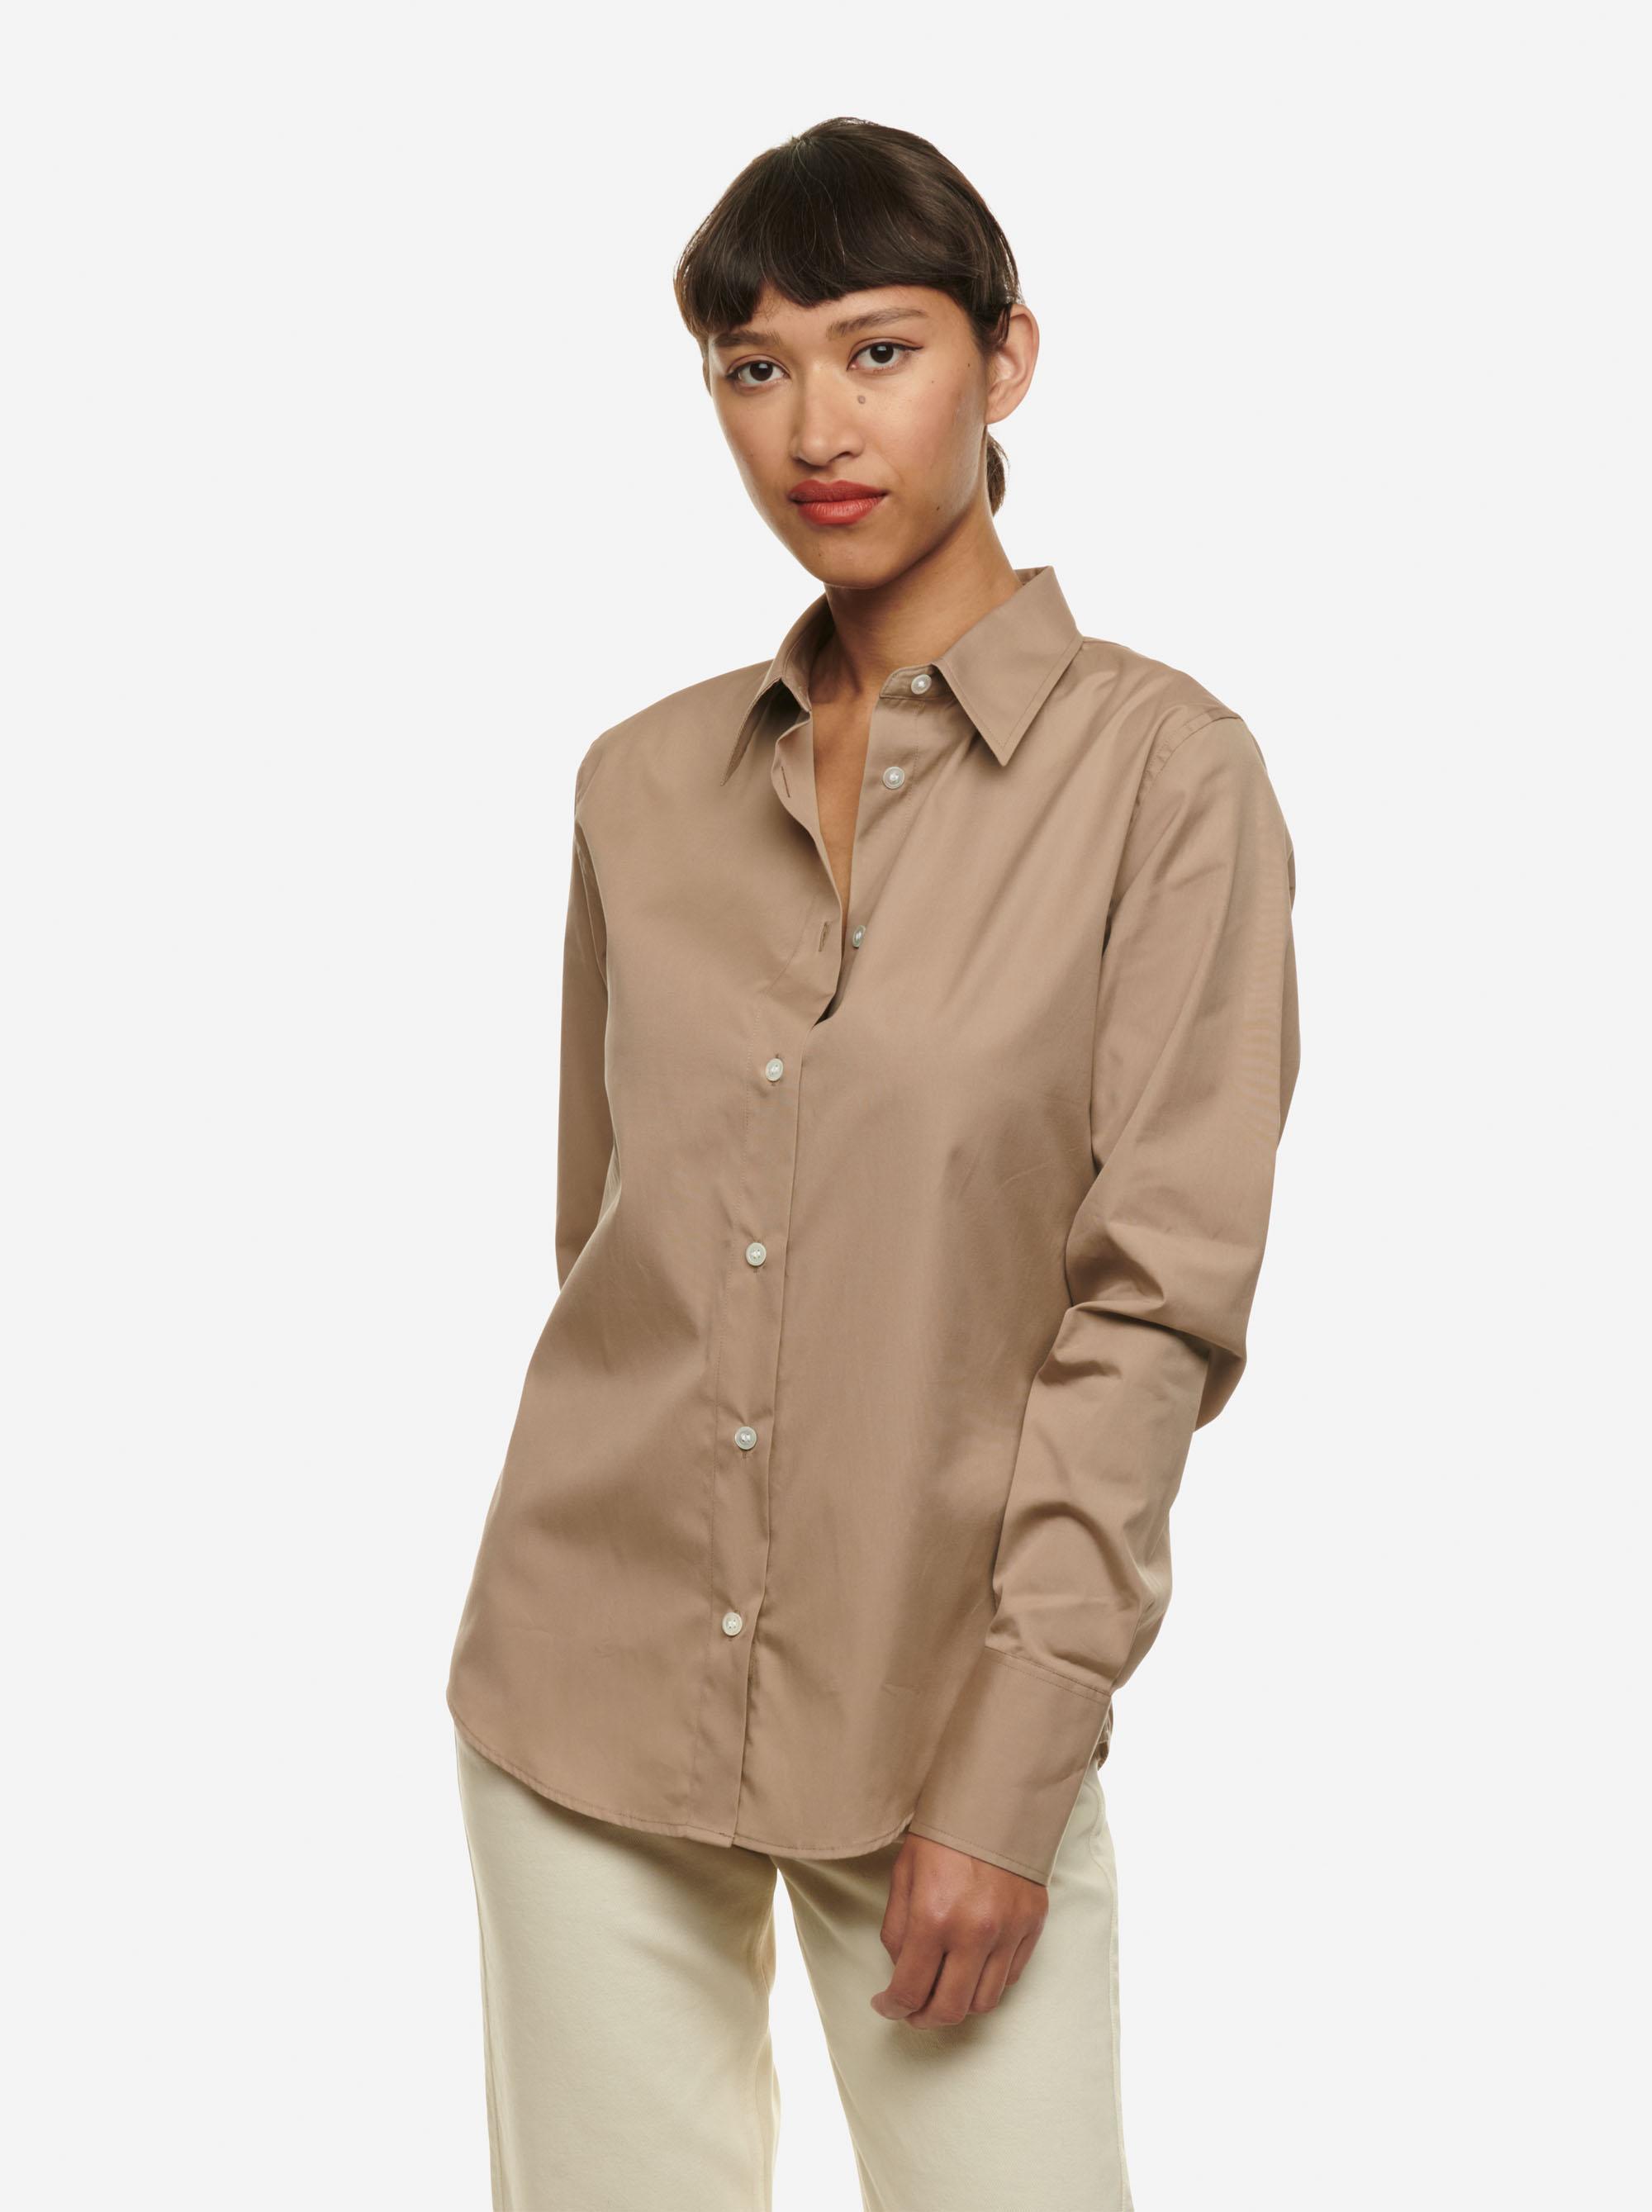 Teym-Shirt-Beige_women-1